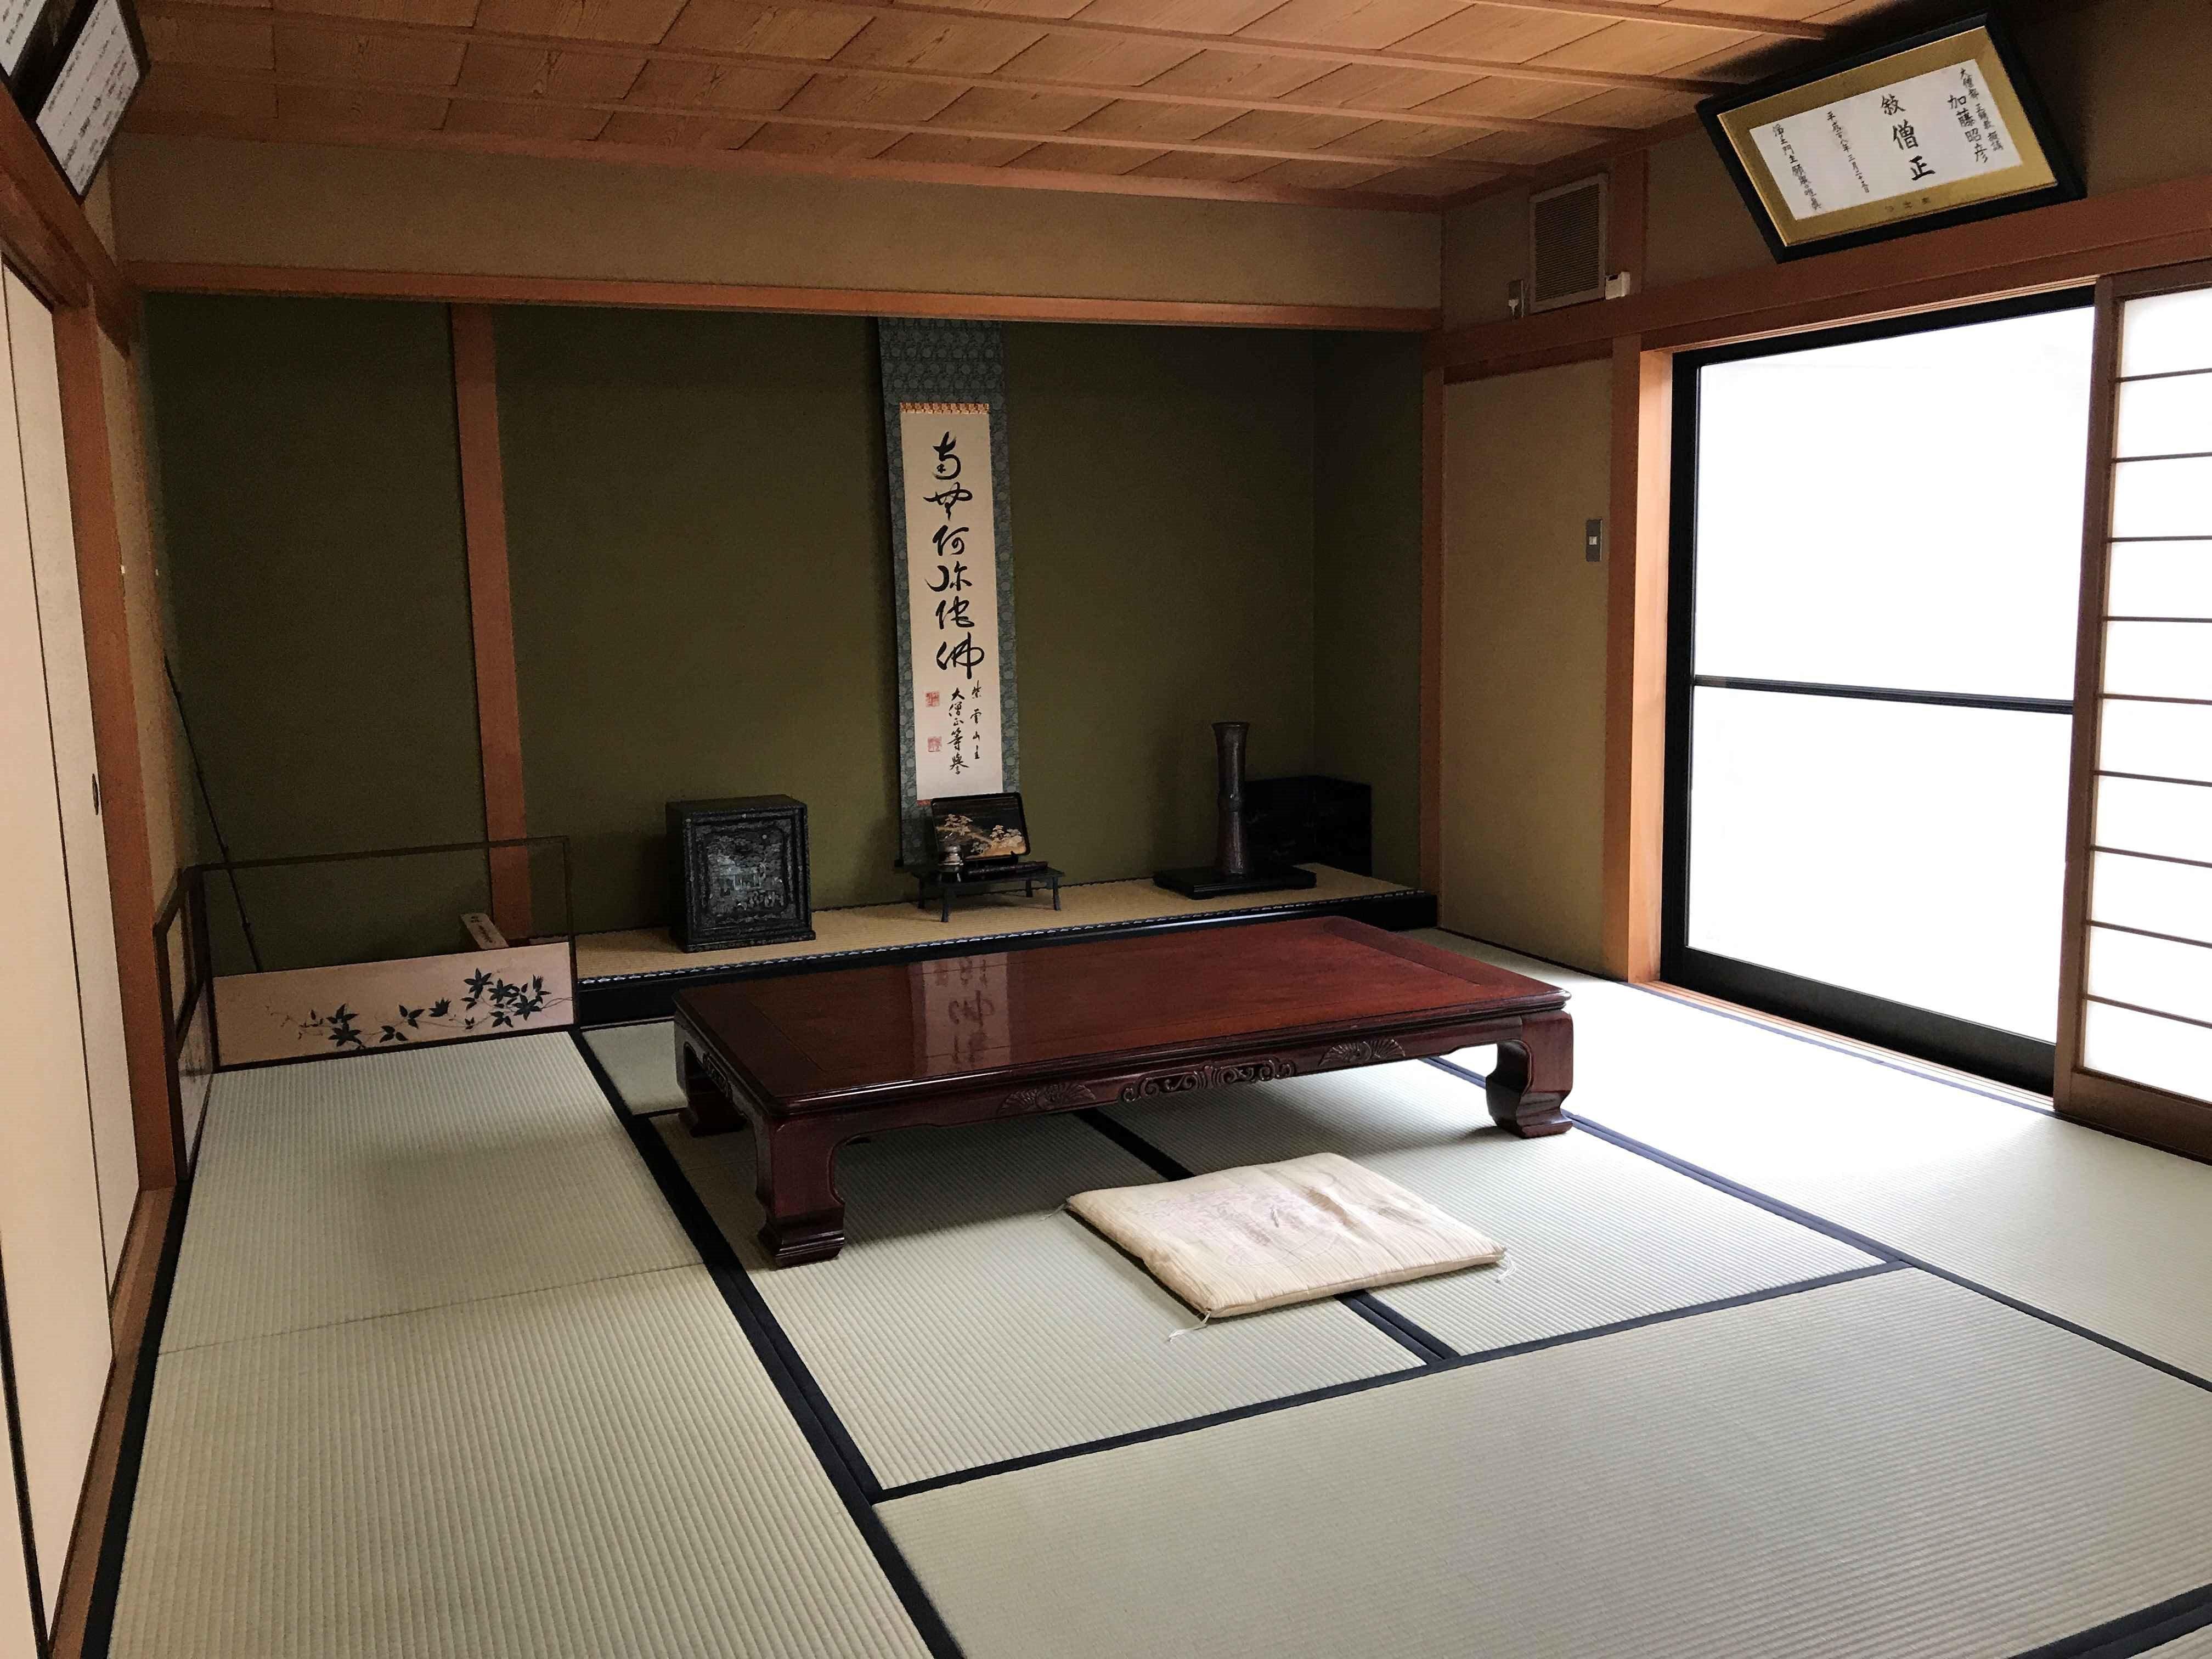 能の仕舞・謡 山崎教室